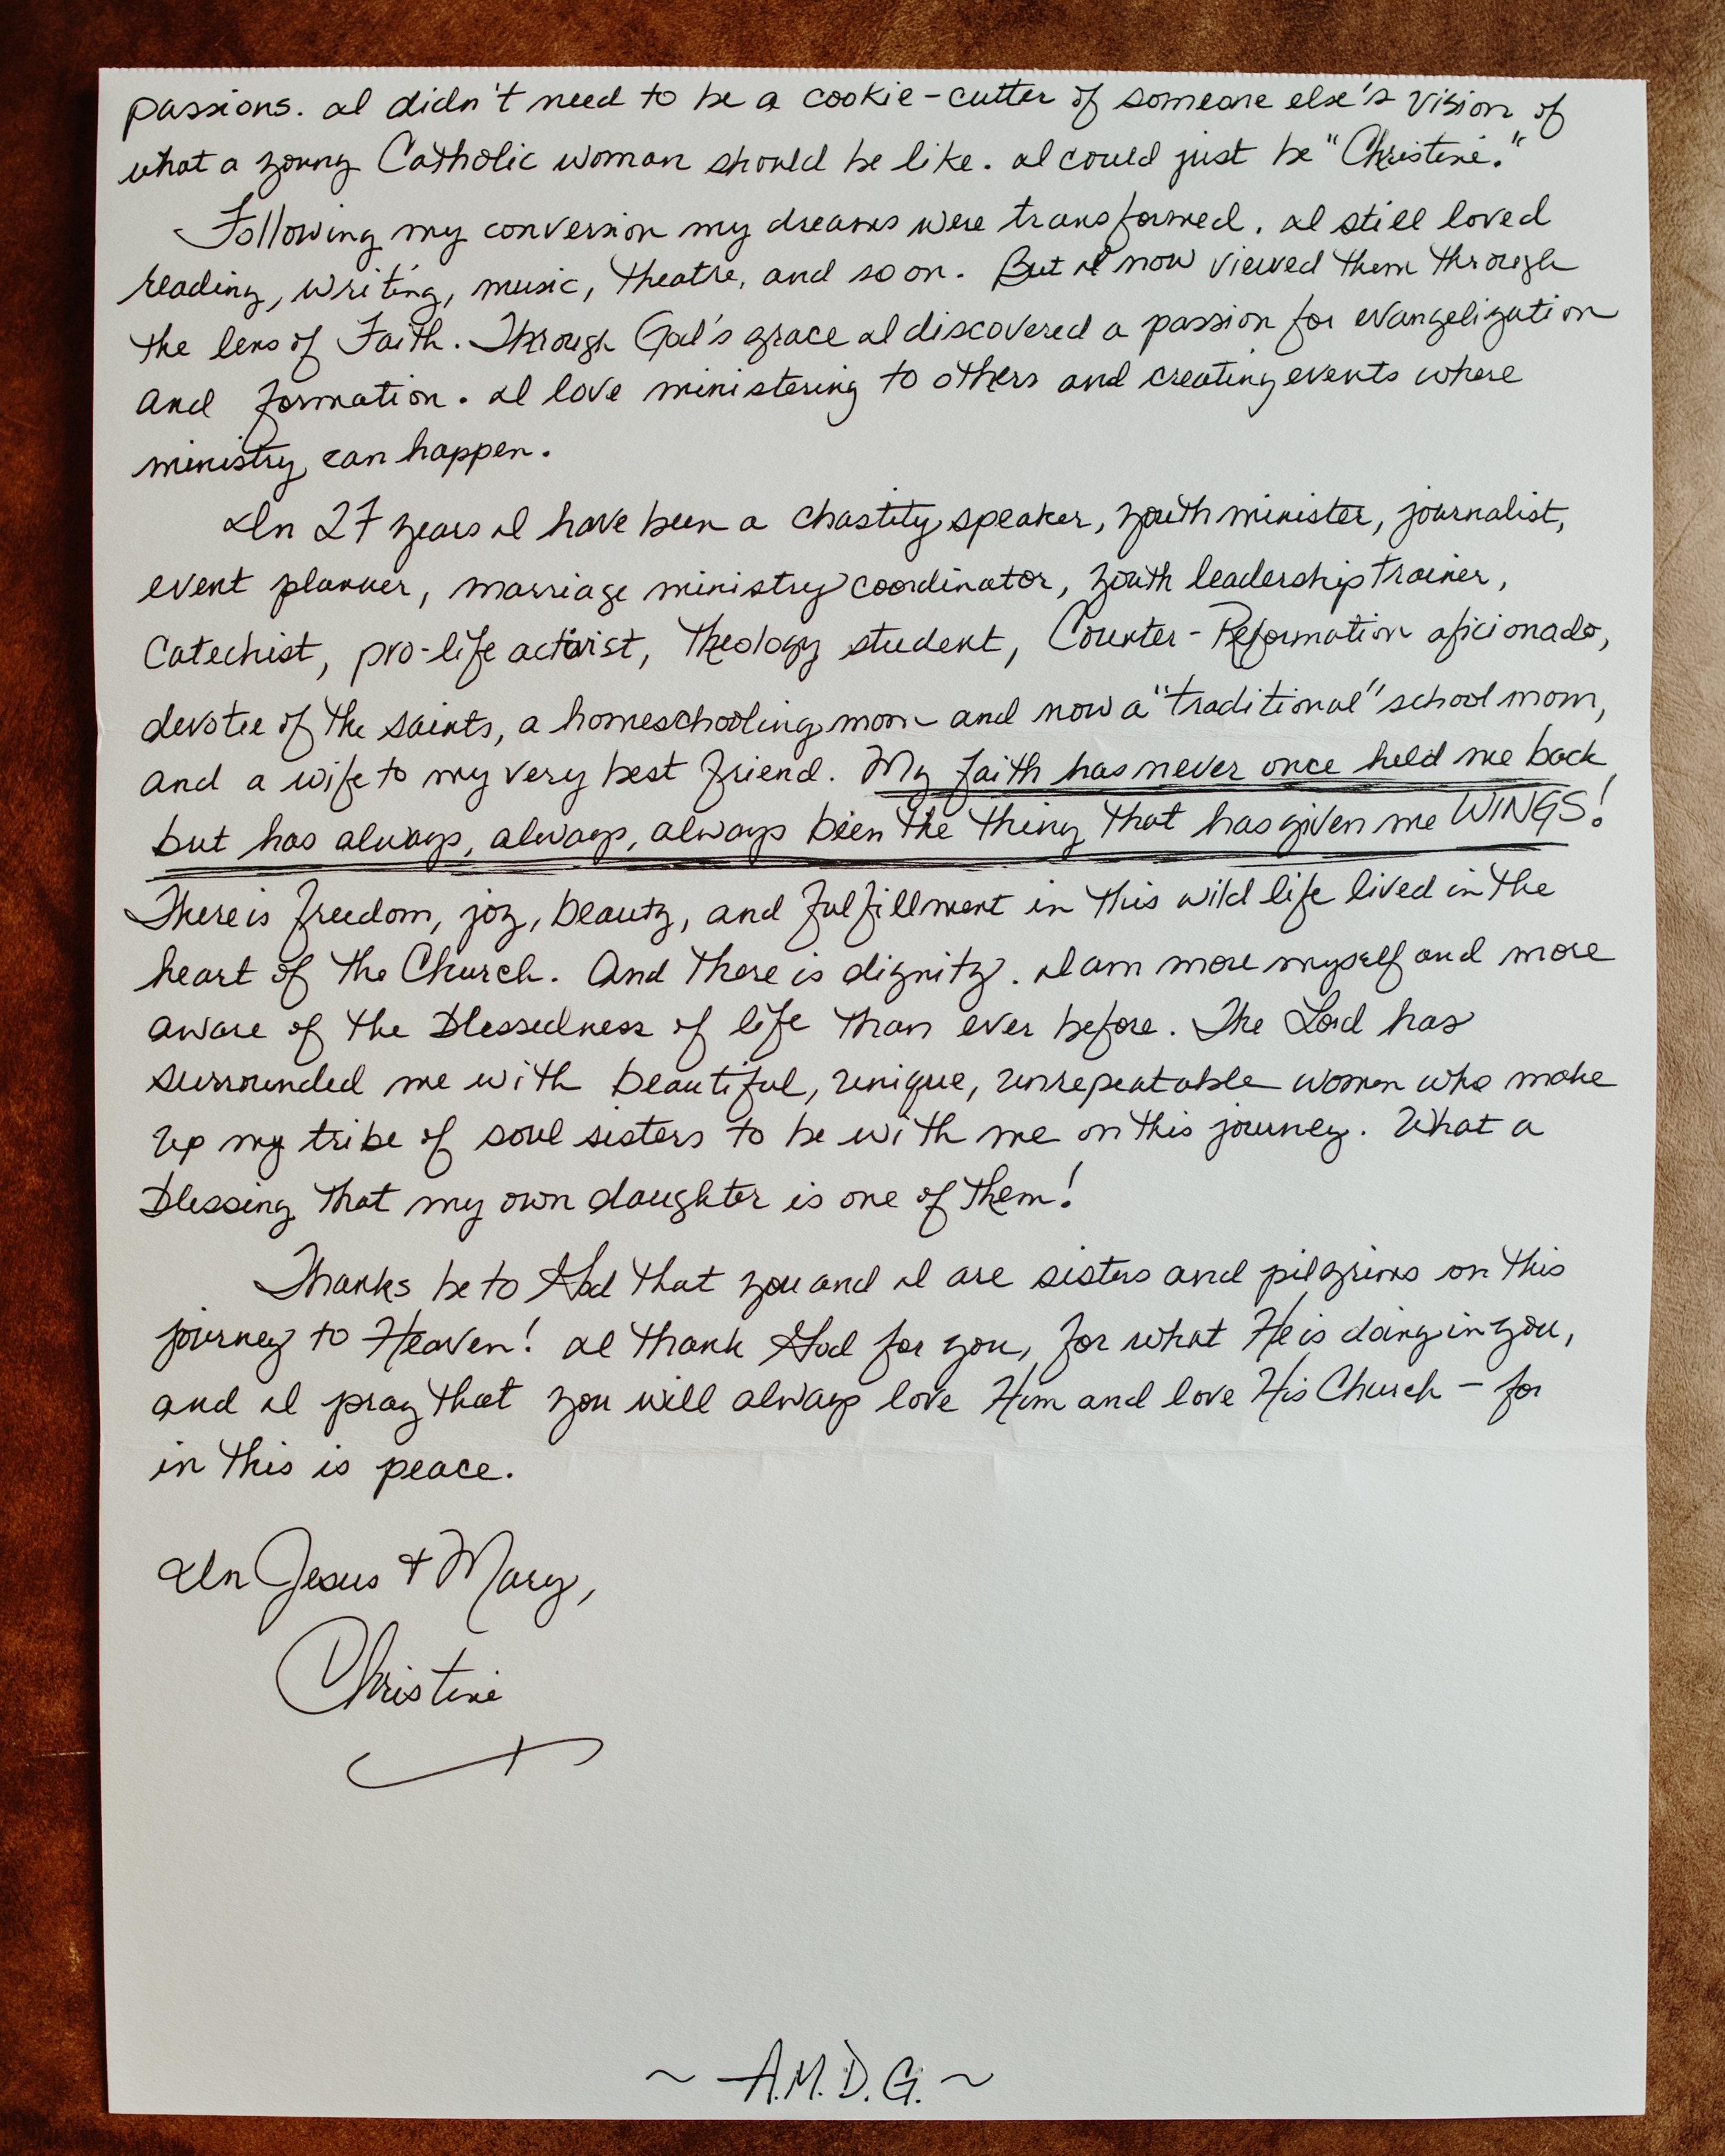 Christine Baglow The Catholic Woman Letter to Women 2